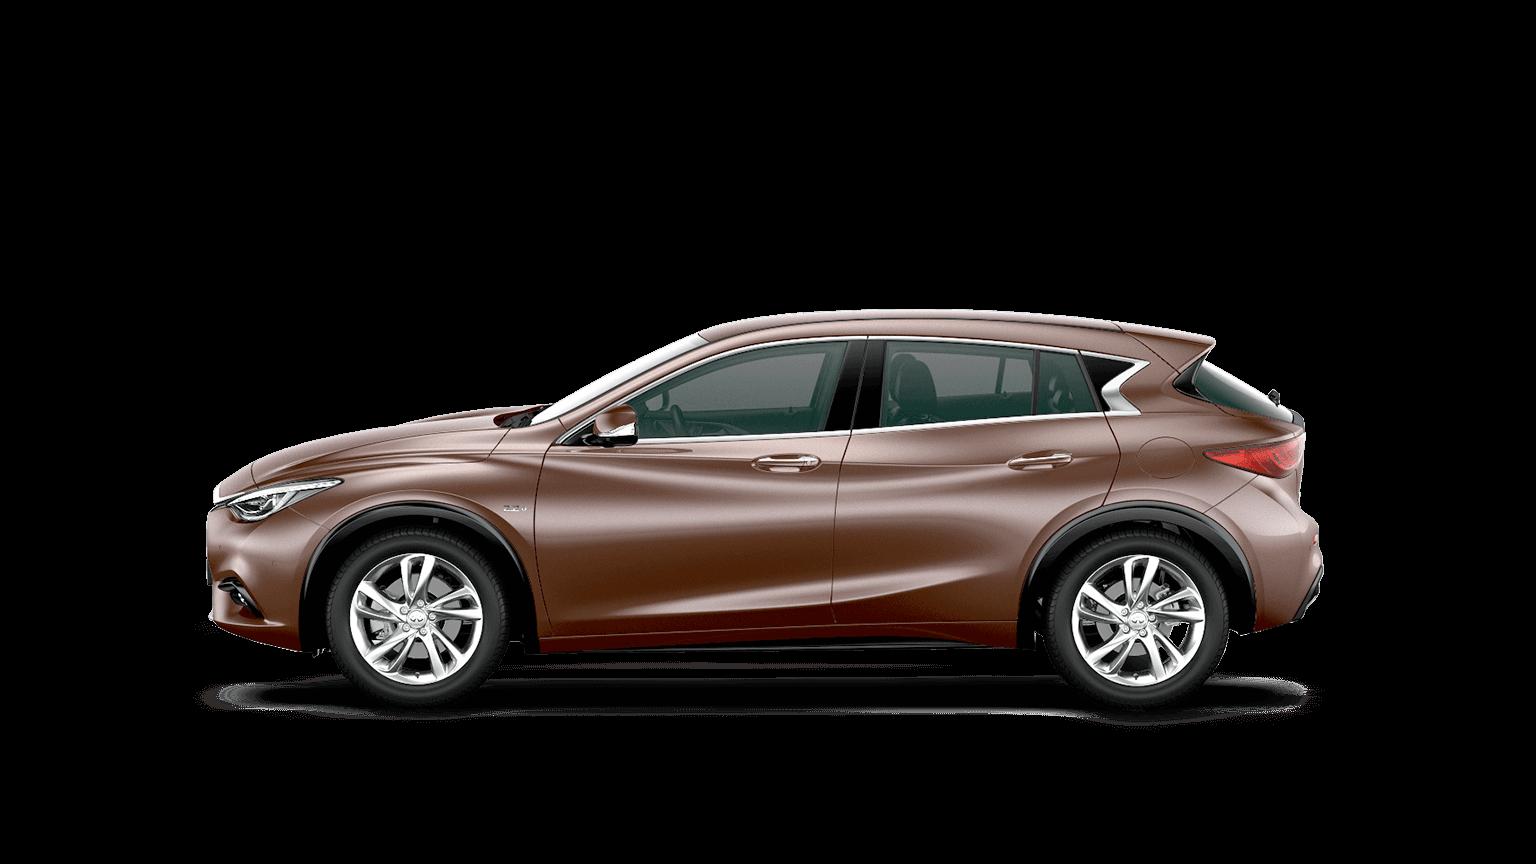 2020 Infiniti Q30 New Model and Performance